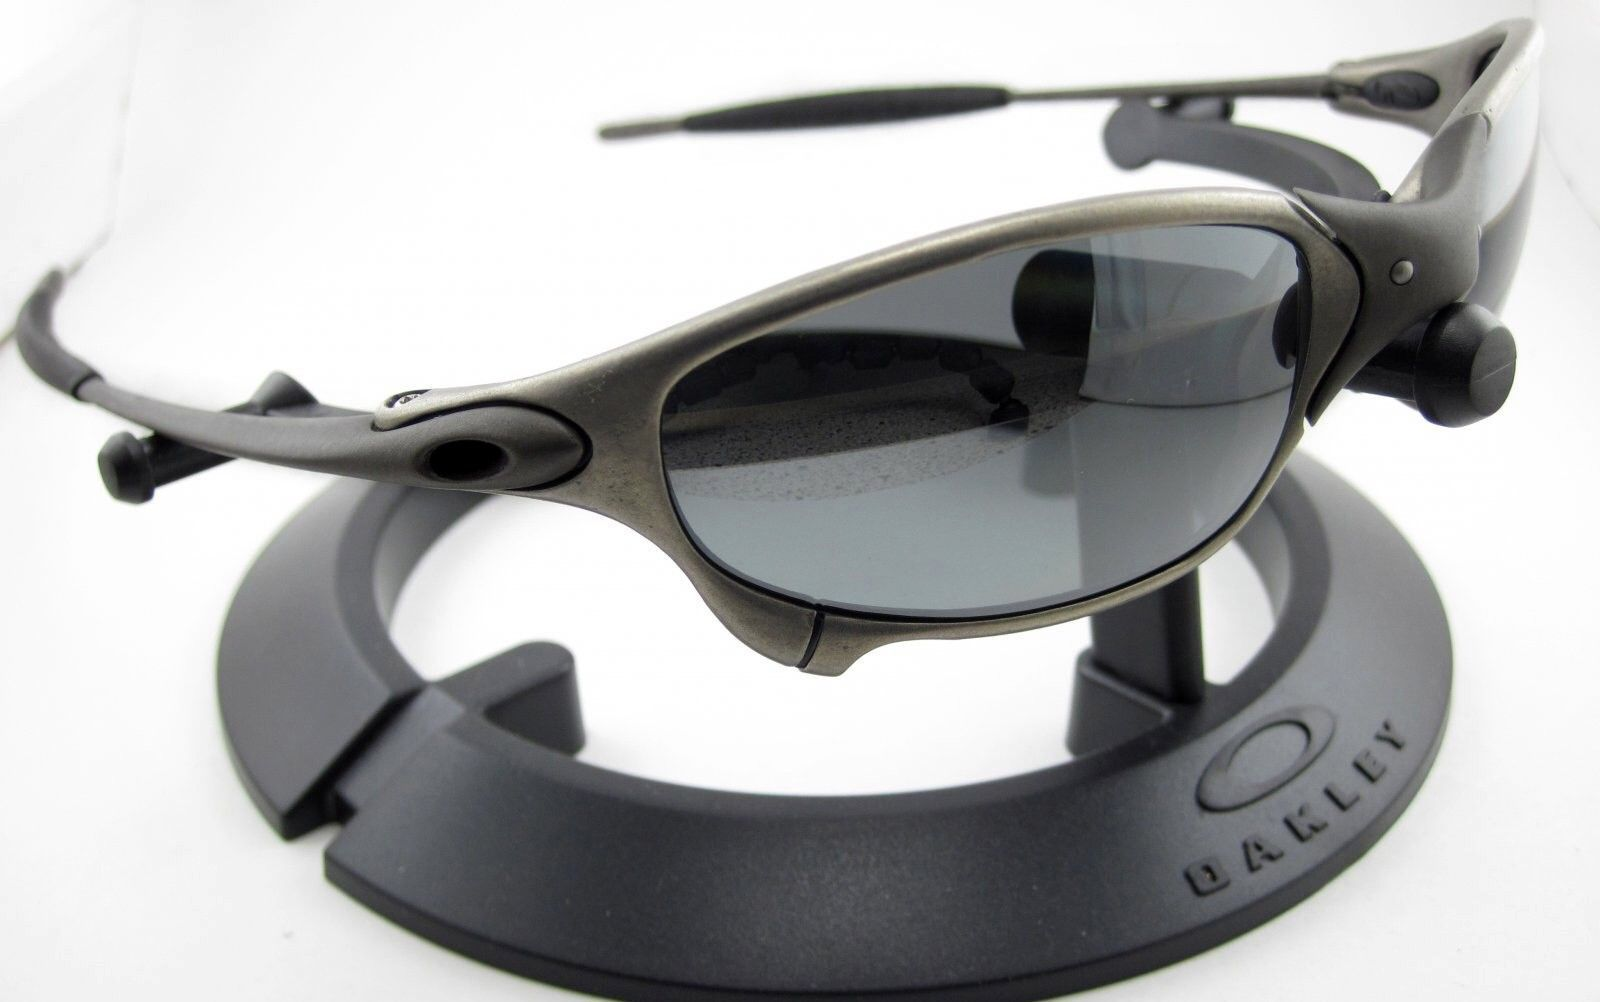 Custom Ti02 Juliet - Photo%20Aug%2008%2C%203%2006%2053%20PM.jpg